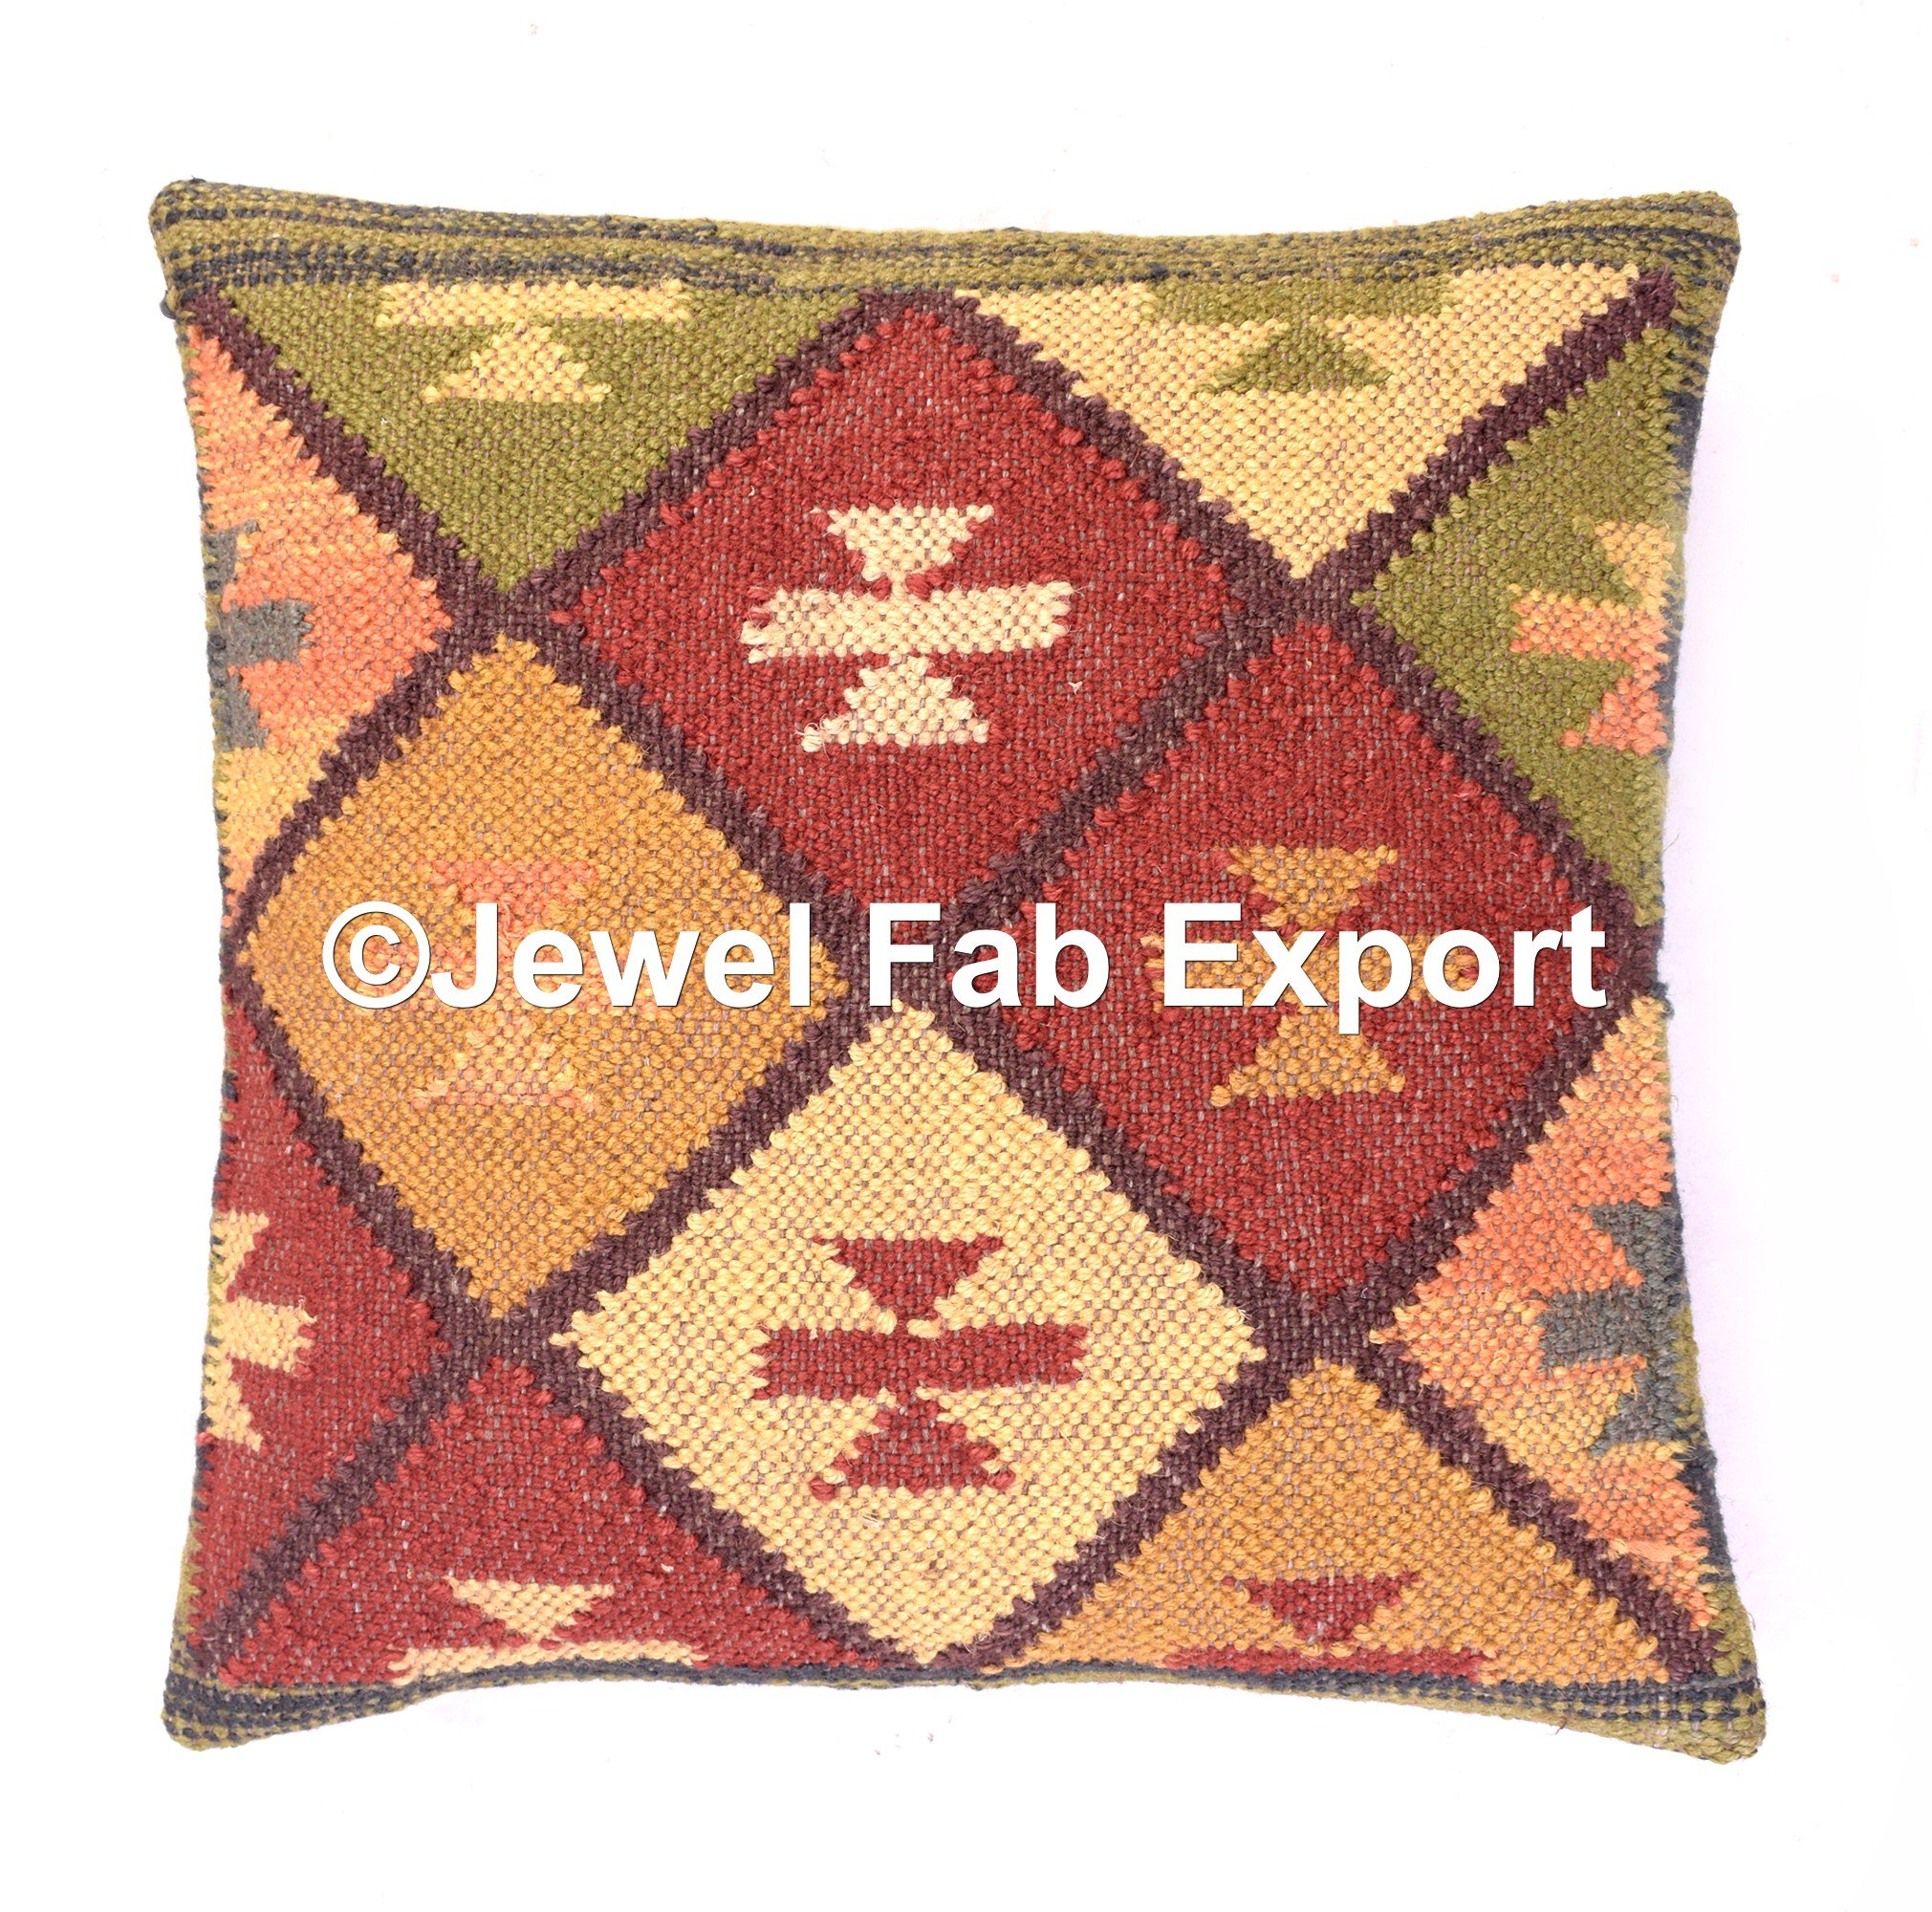 Set Of 5 Indian Kilim Cushion 18x18'' Vintage Ethnic Kilim Rug Cushion Handwoven Jute Cuashion Decorative Cushion Cases Sofa Hippie Pillow Sham Living Room Pillow Throw Handmade Jute Boho Sham Throw